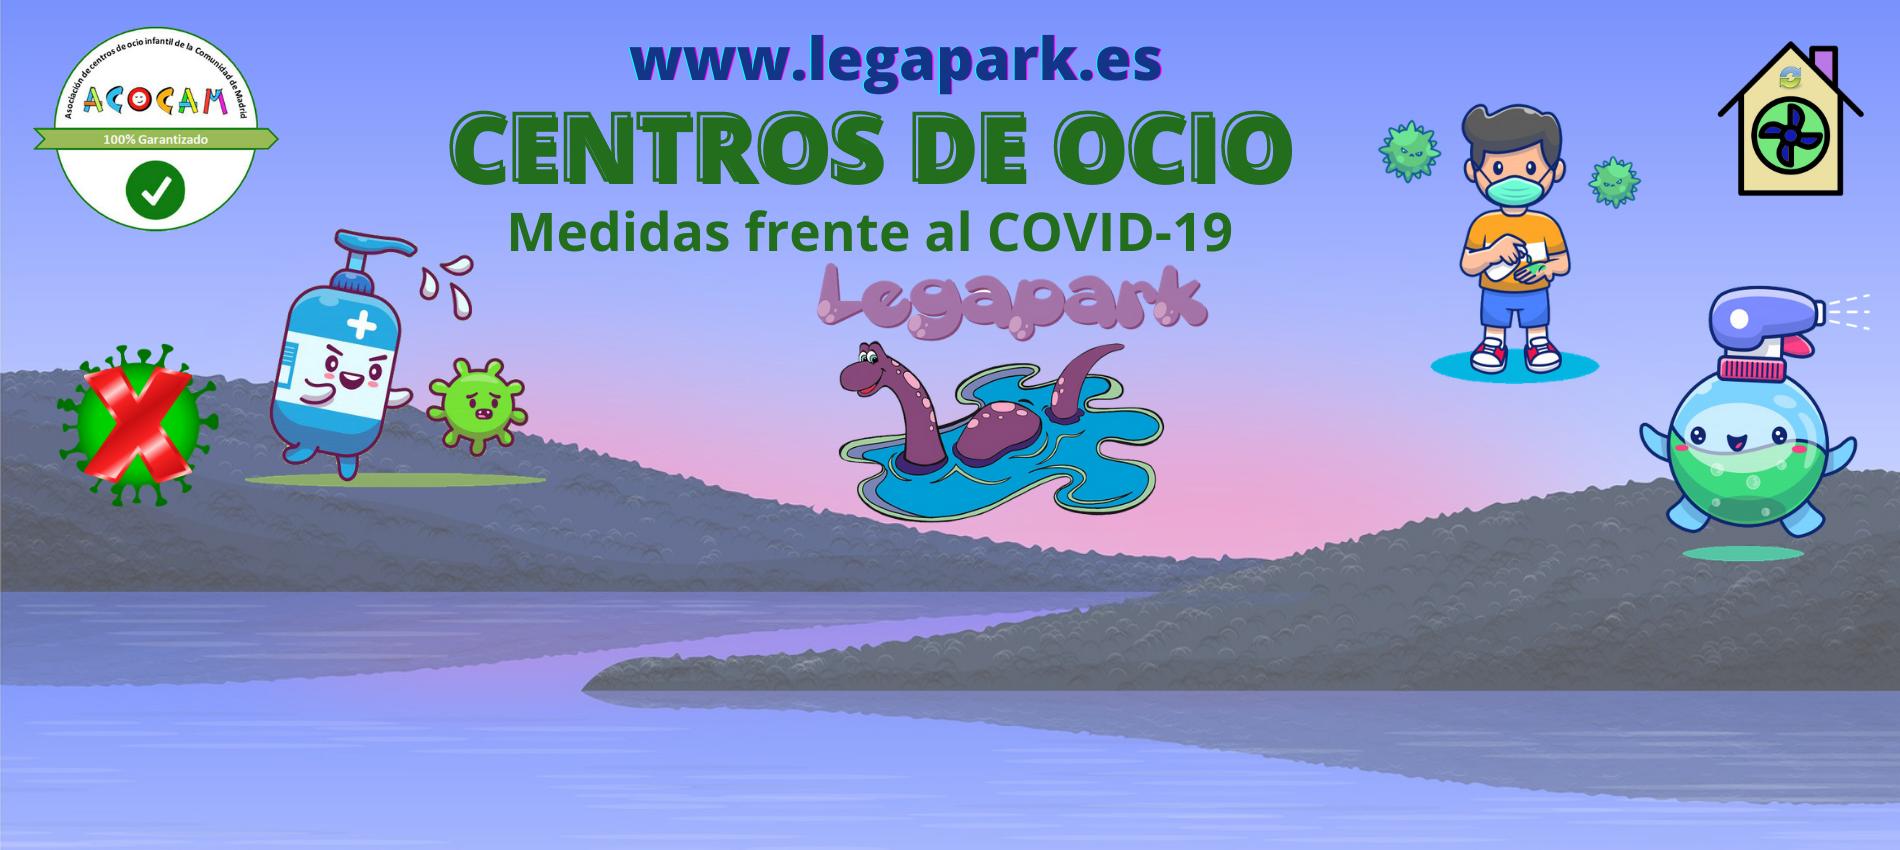 covid-medidas-mundo-legapark